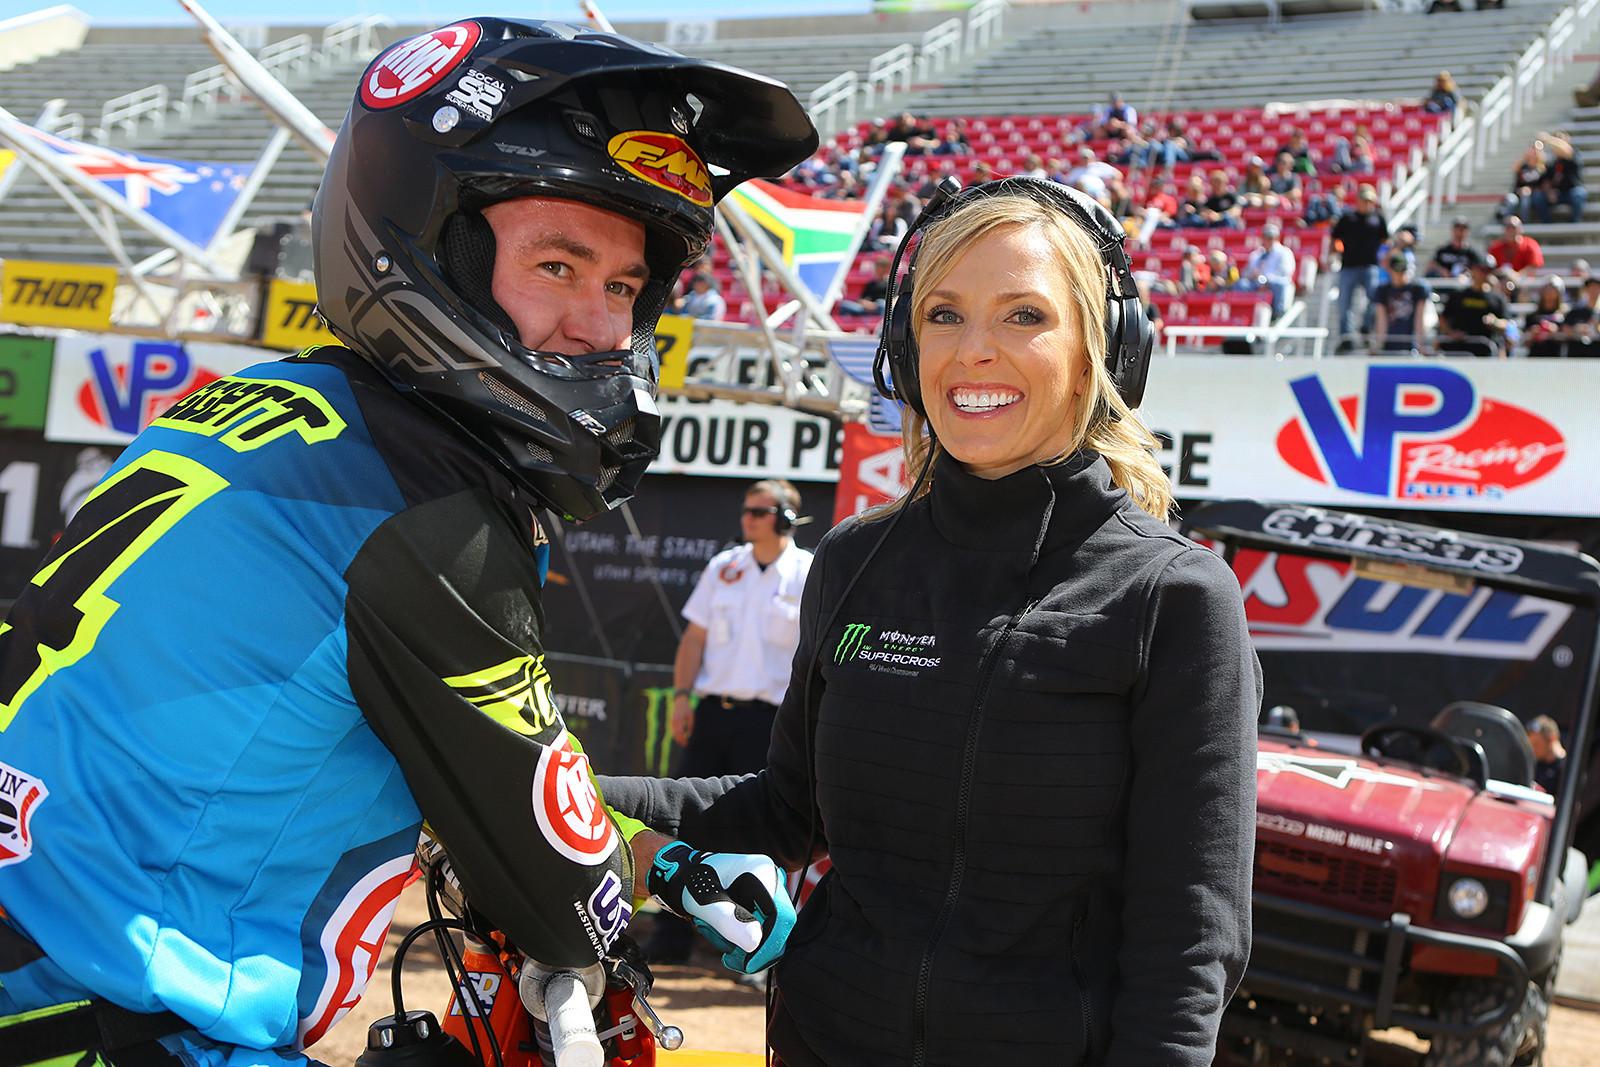 Blake Baggett and Ashley Phillips - Vital MX Pit Bits: Salt Lake City - Motocross Pictures - Vital MX